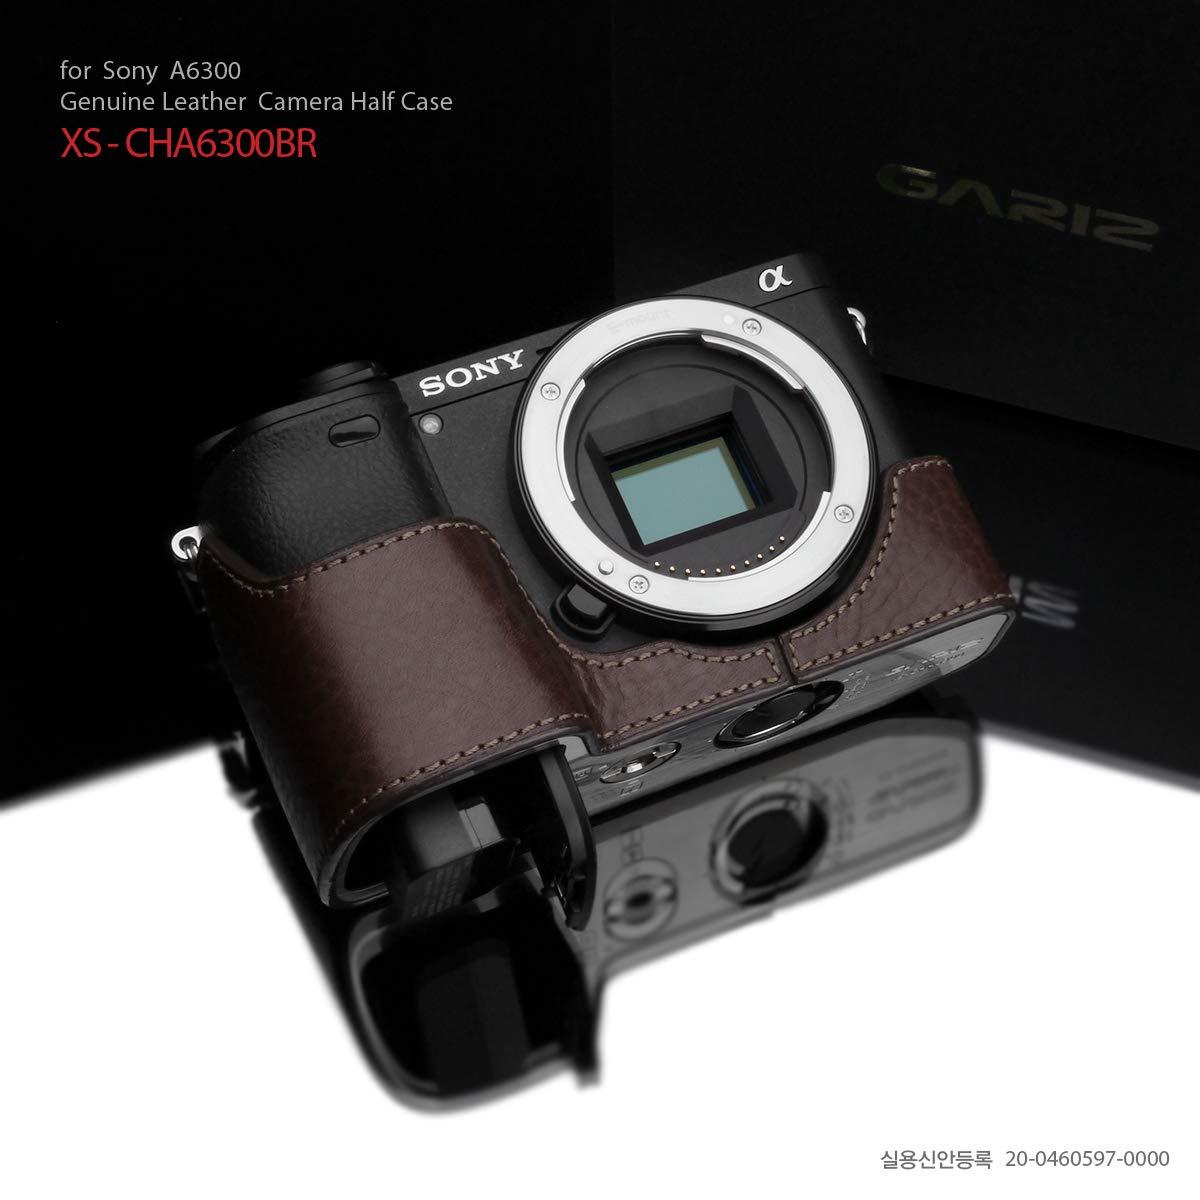 Gariz XS-CHA6300/A6400BR 本革ハーフケース Sony A6400 / A6300用 ブラウン B07QRPQYVZ